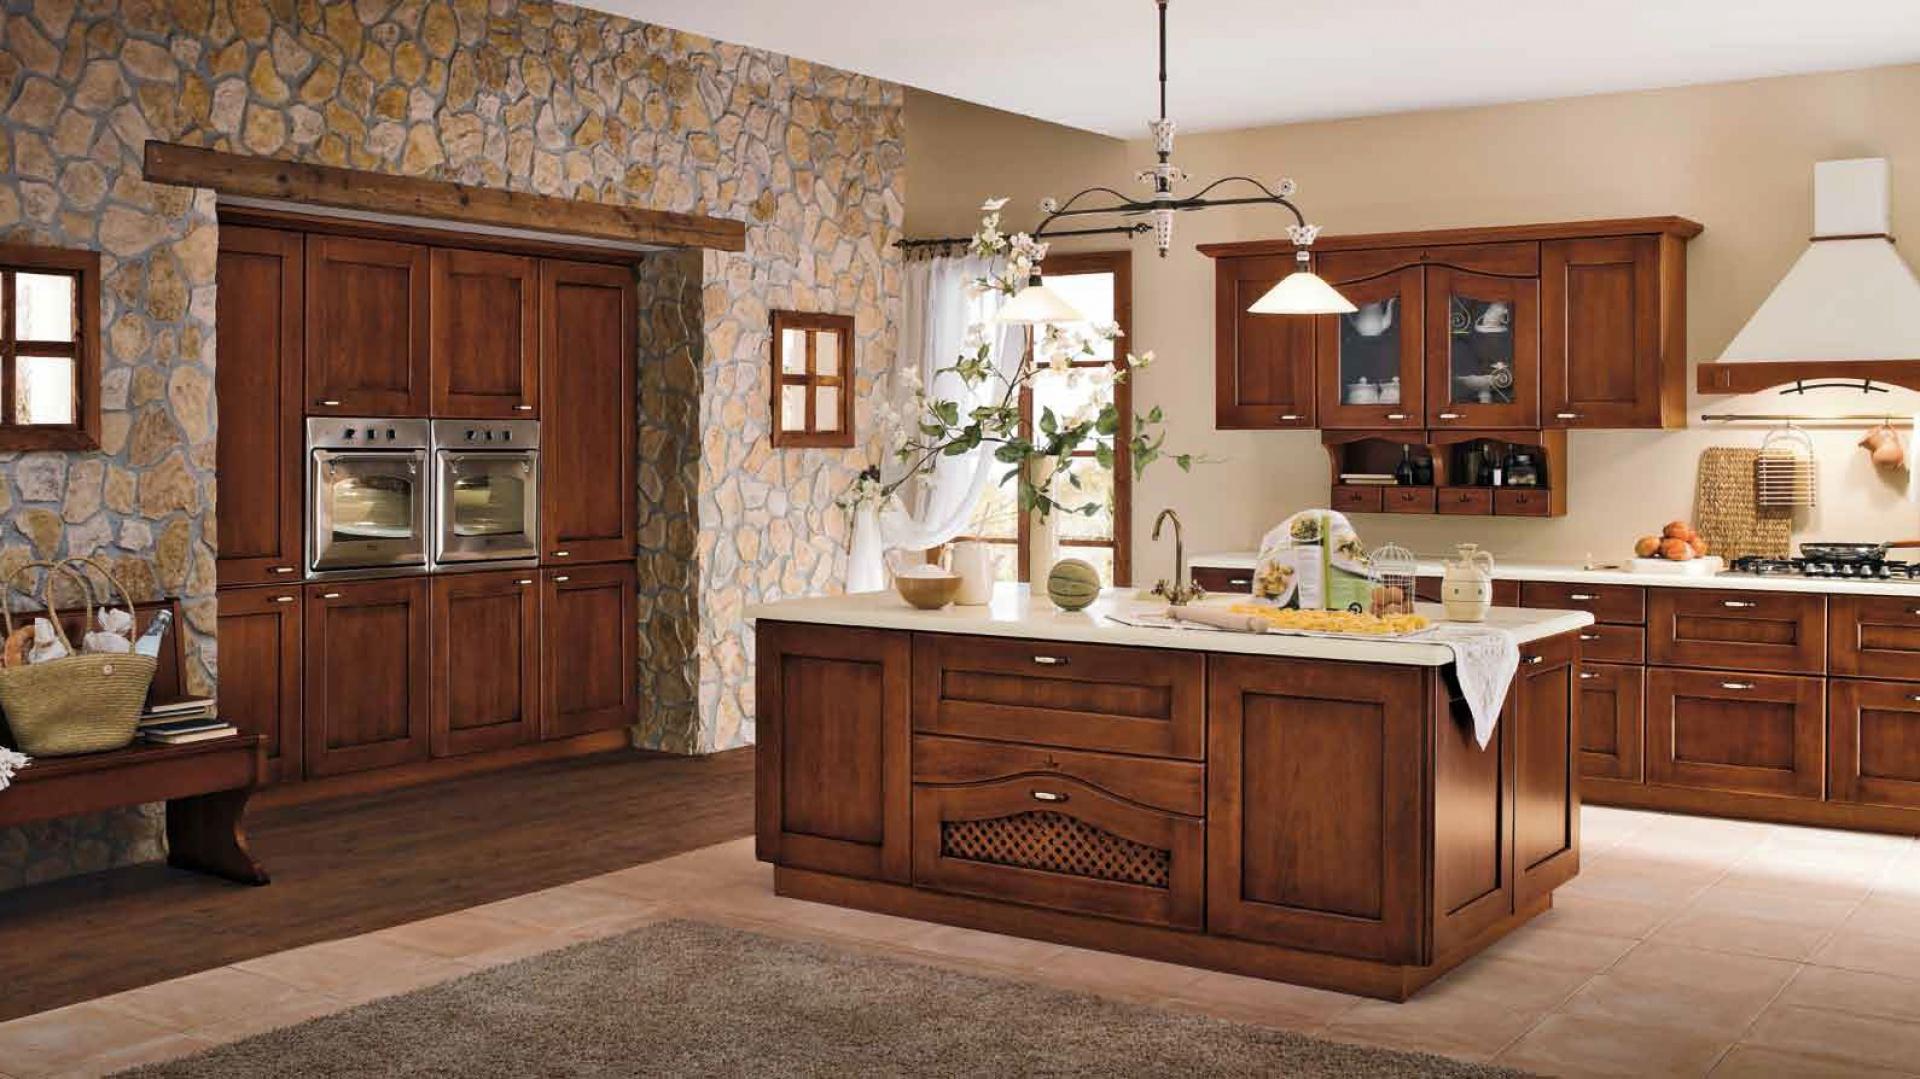 ciana z kamienia drewniana kuchnia ciep a pi kna naturalna strona 15. Black Bedroom Furniture Sets. Home Design Ideas